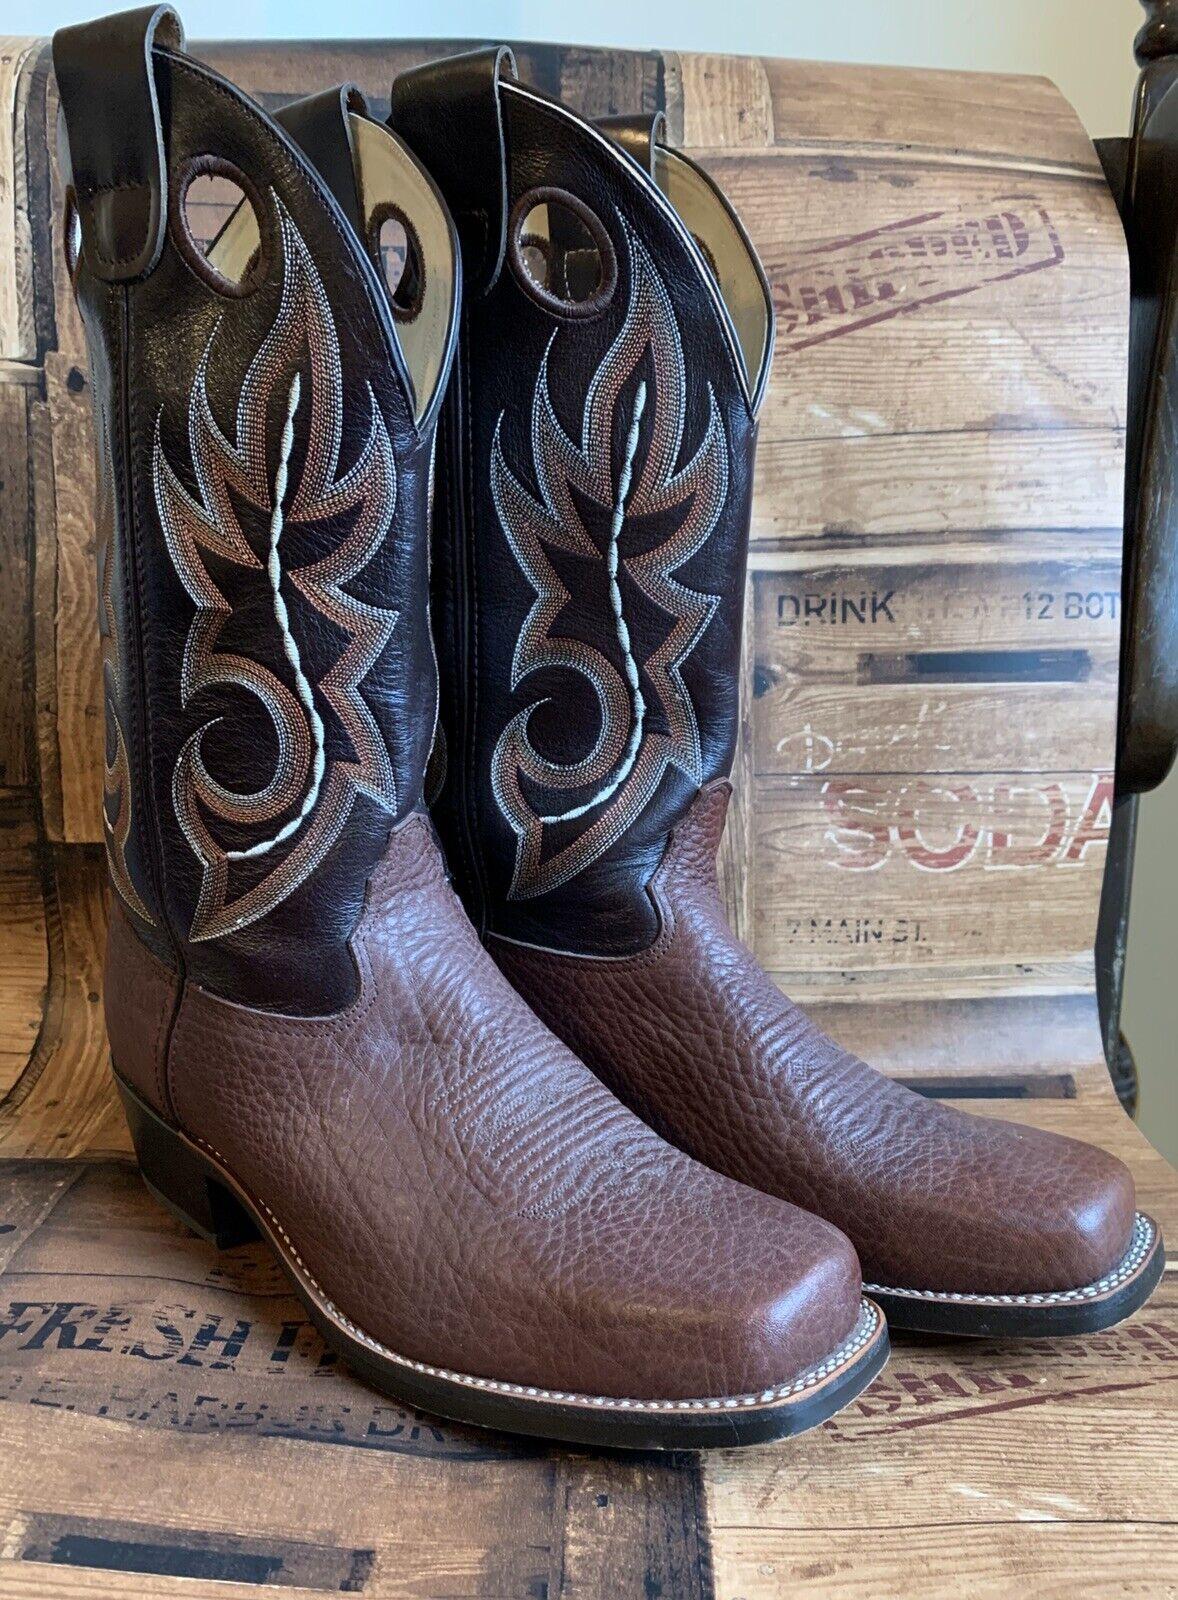 Durango Cowboy Boots UK Size 9